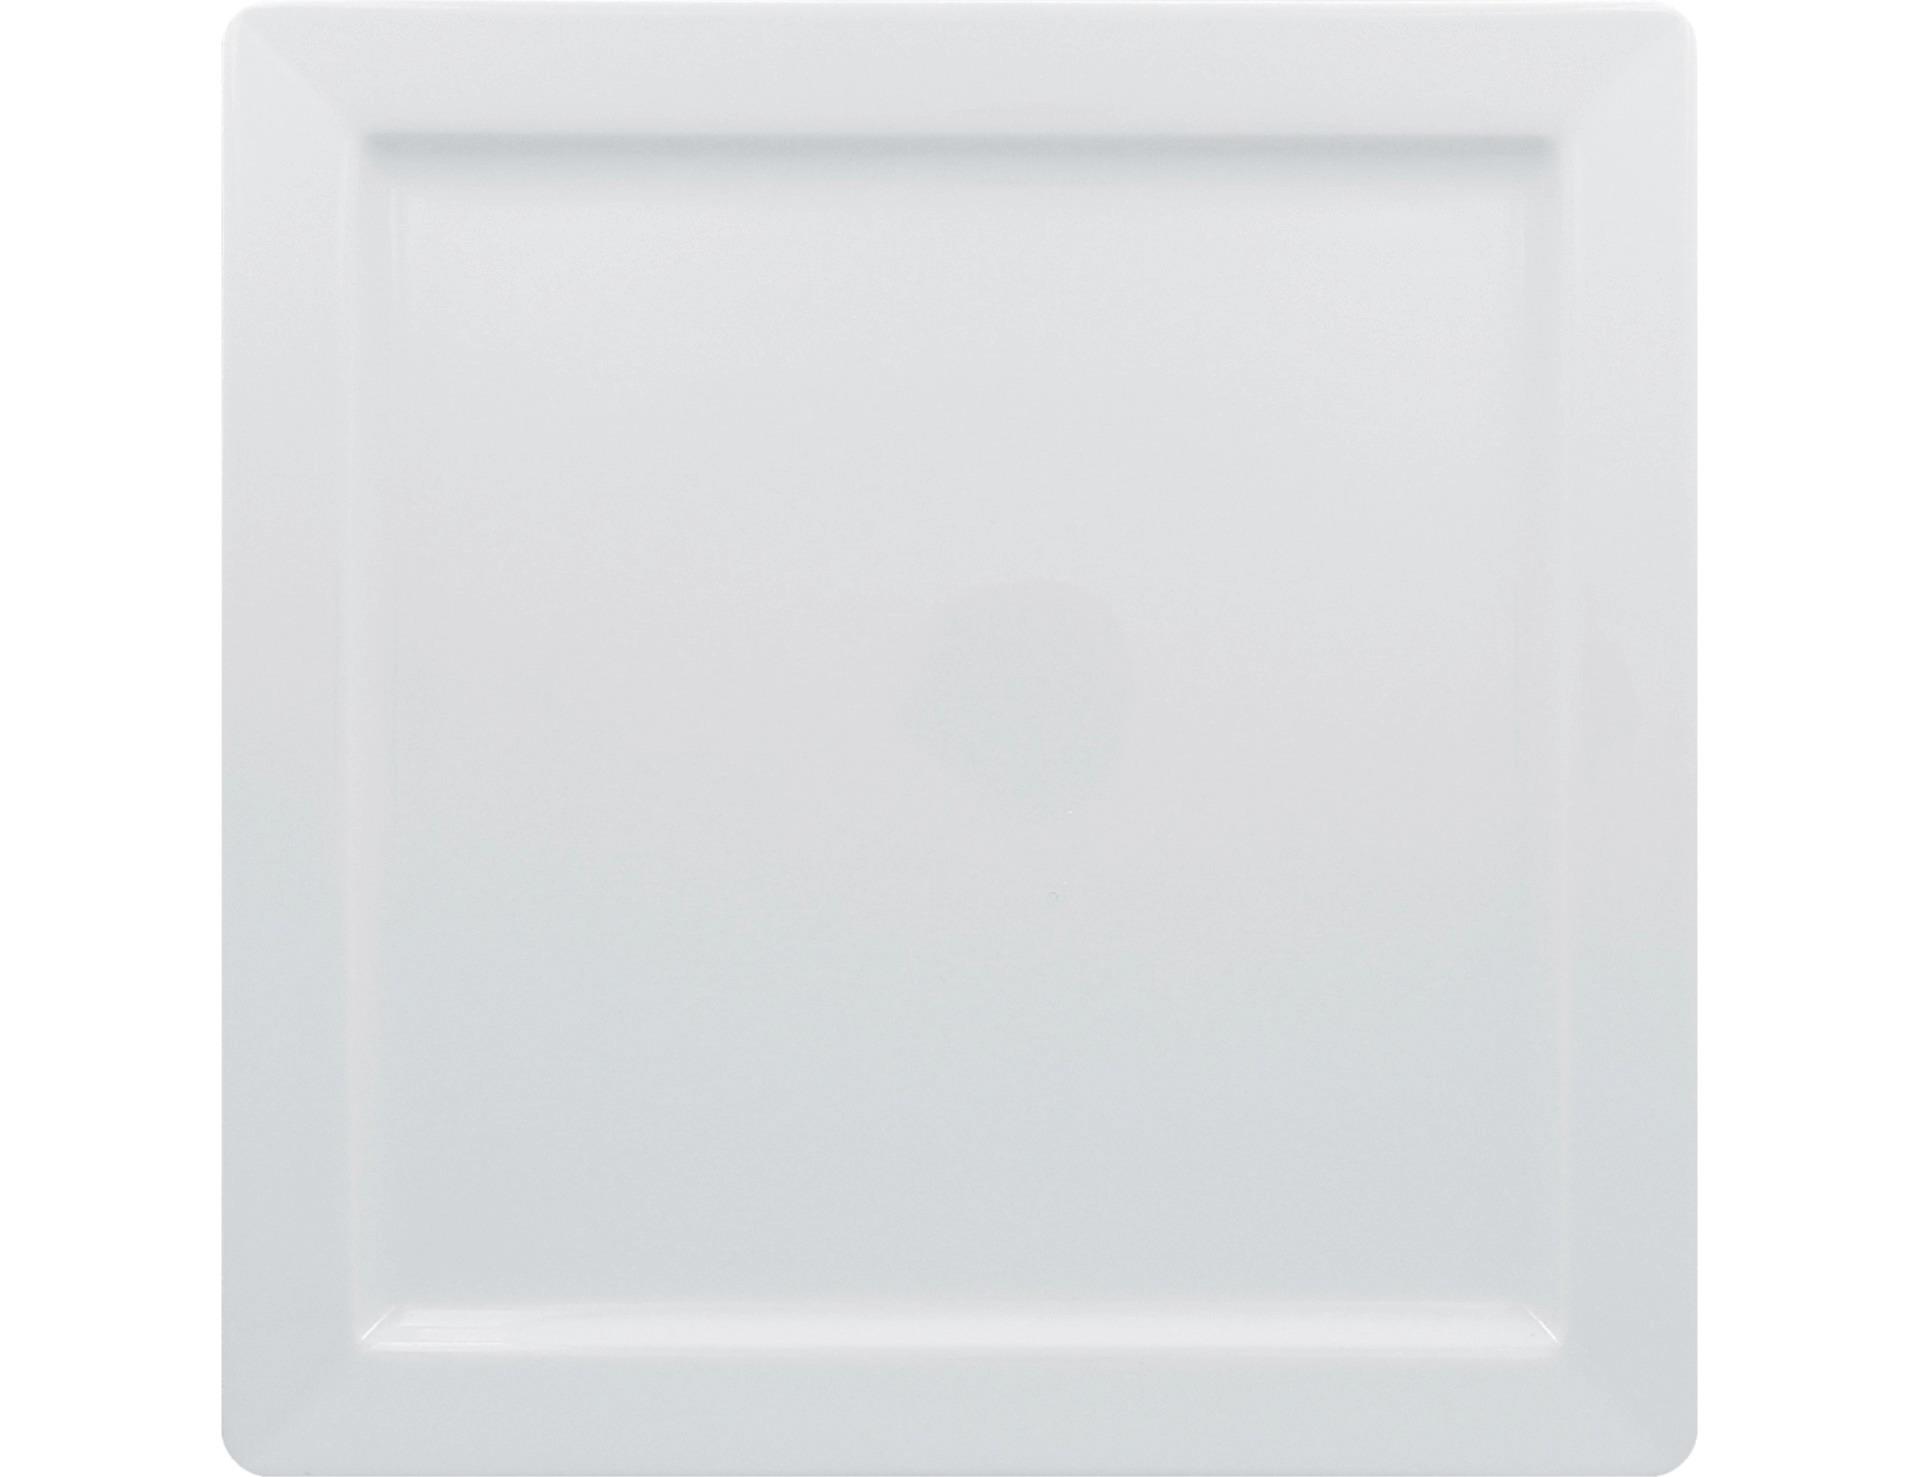 Teller quadratisch 300 x 300 mm bright-white